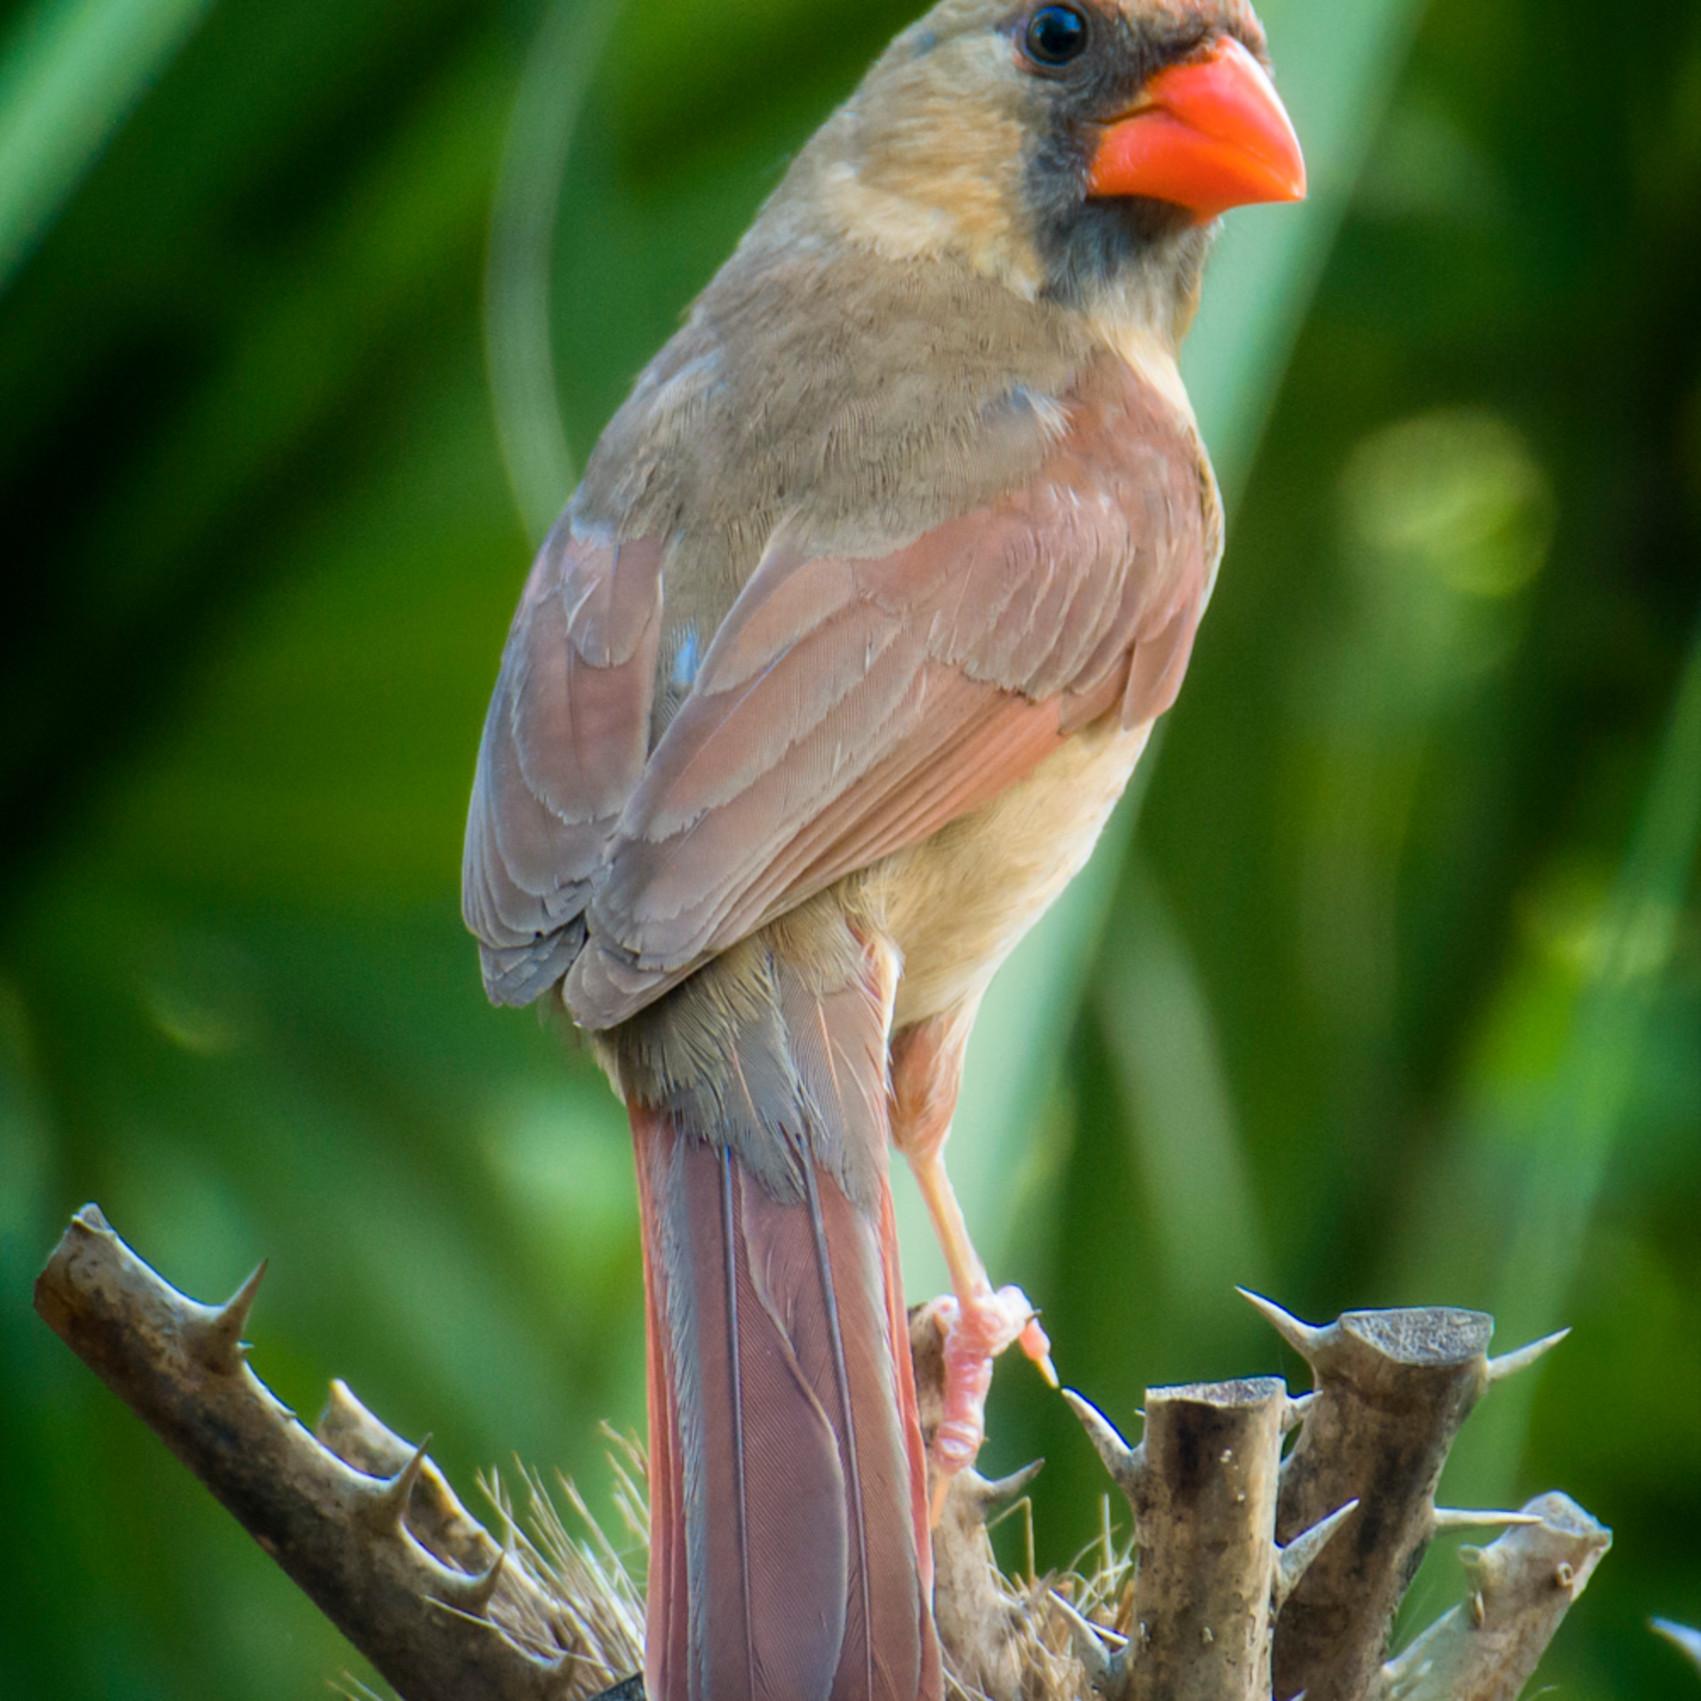 Backyard birds june 2020 20200611 0336 syn8vh